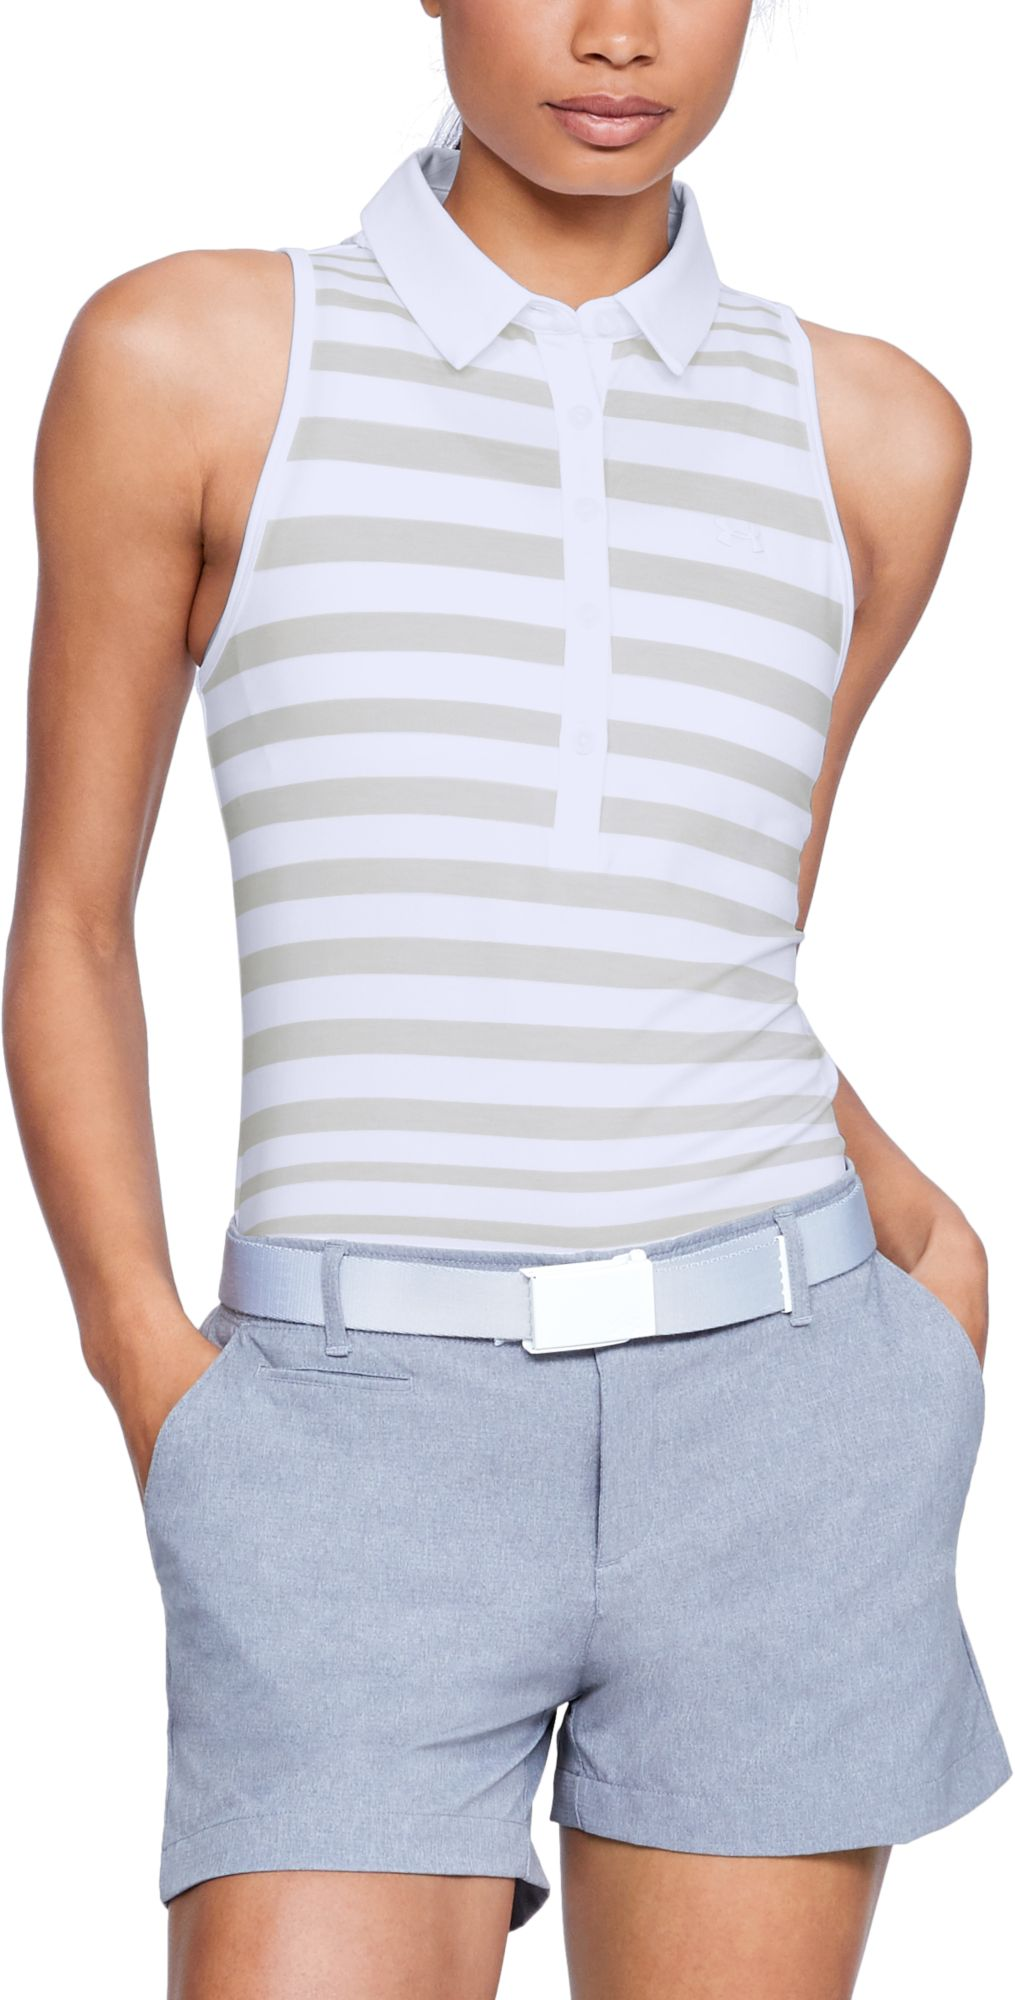 963accc5 Under Armour Women's Zinger Novelty Wide Stripe Sleeveless Golf Polo, Size:  Large, White